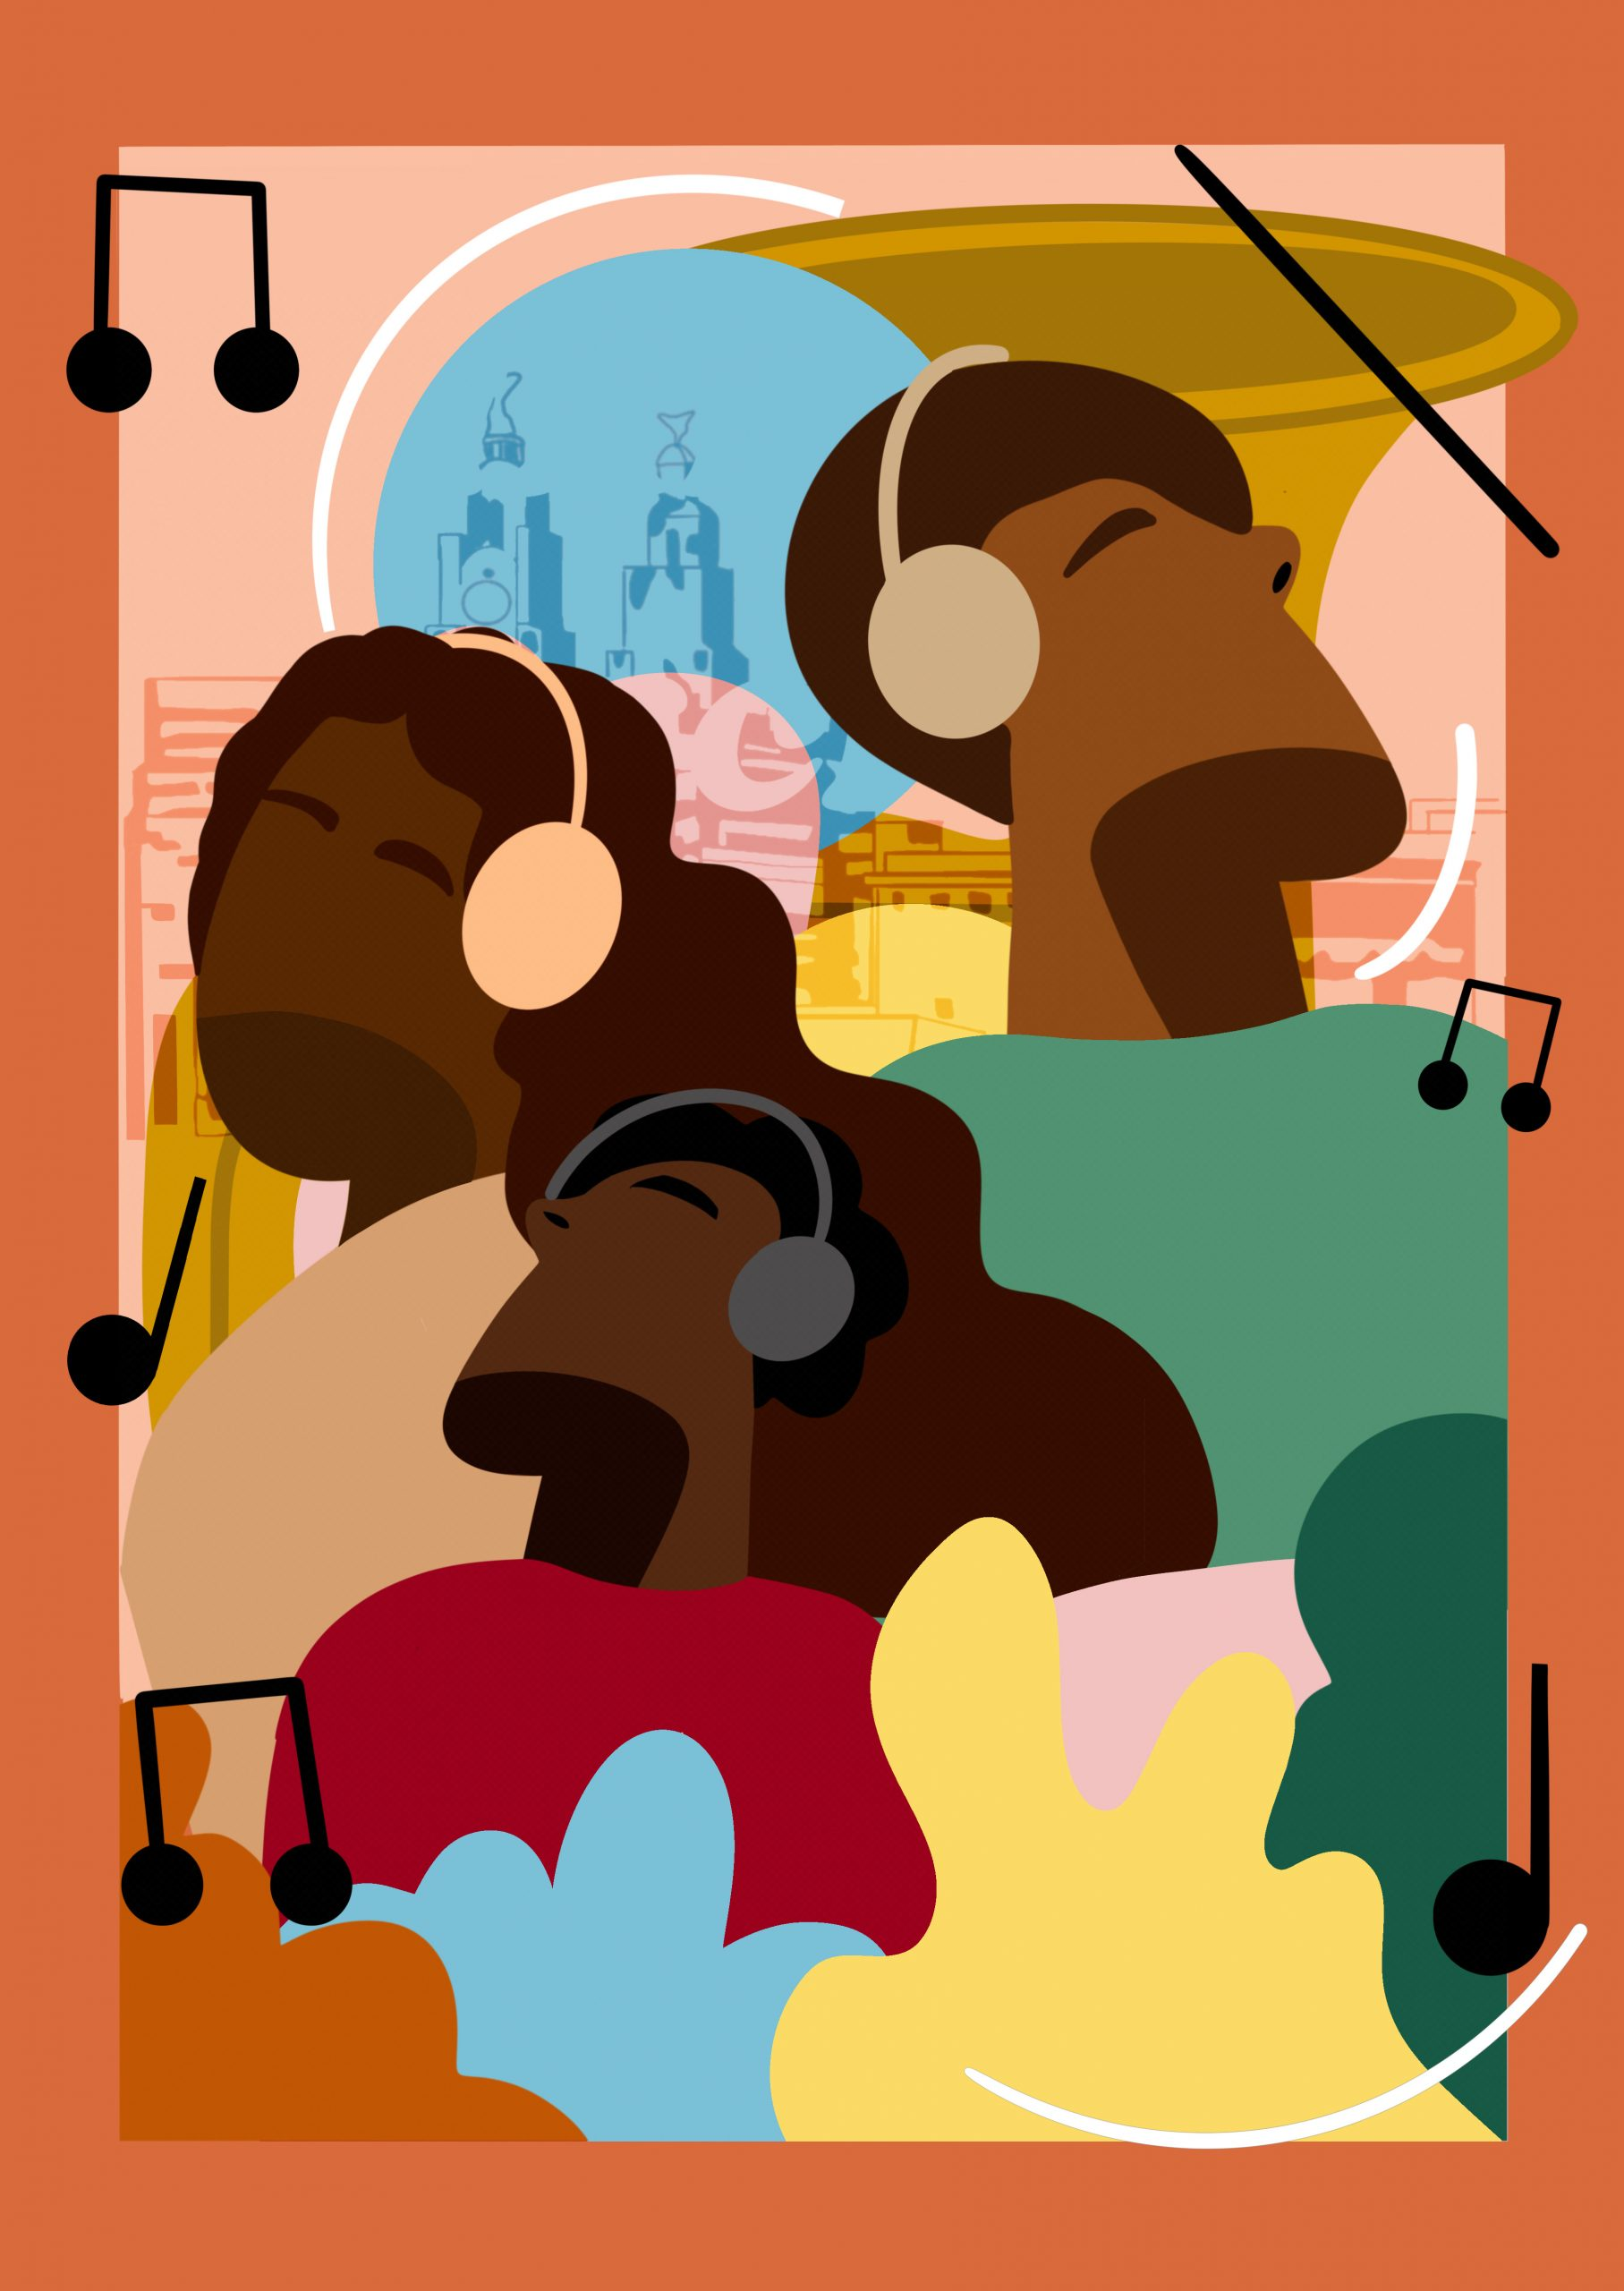 LCR Music Board's Black Lives Matter Manifesto